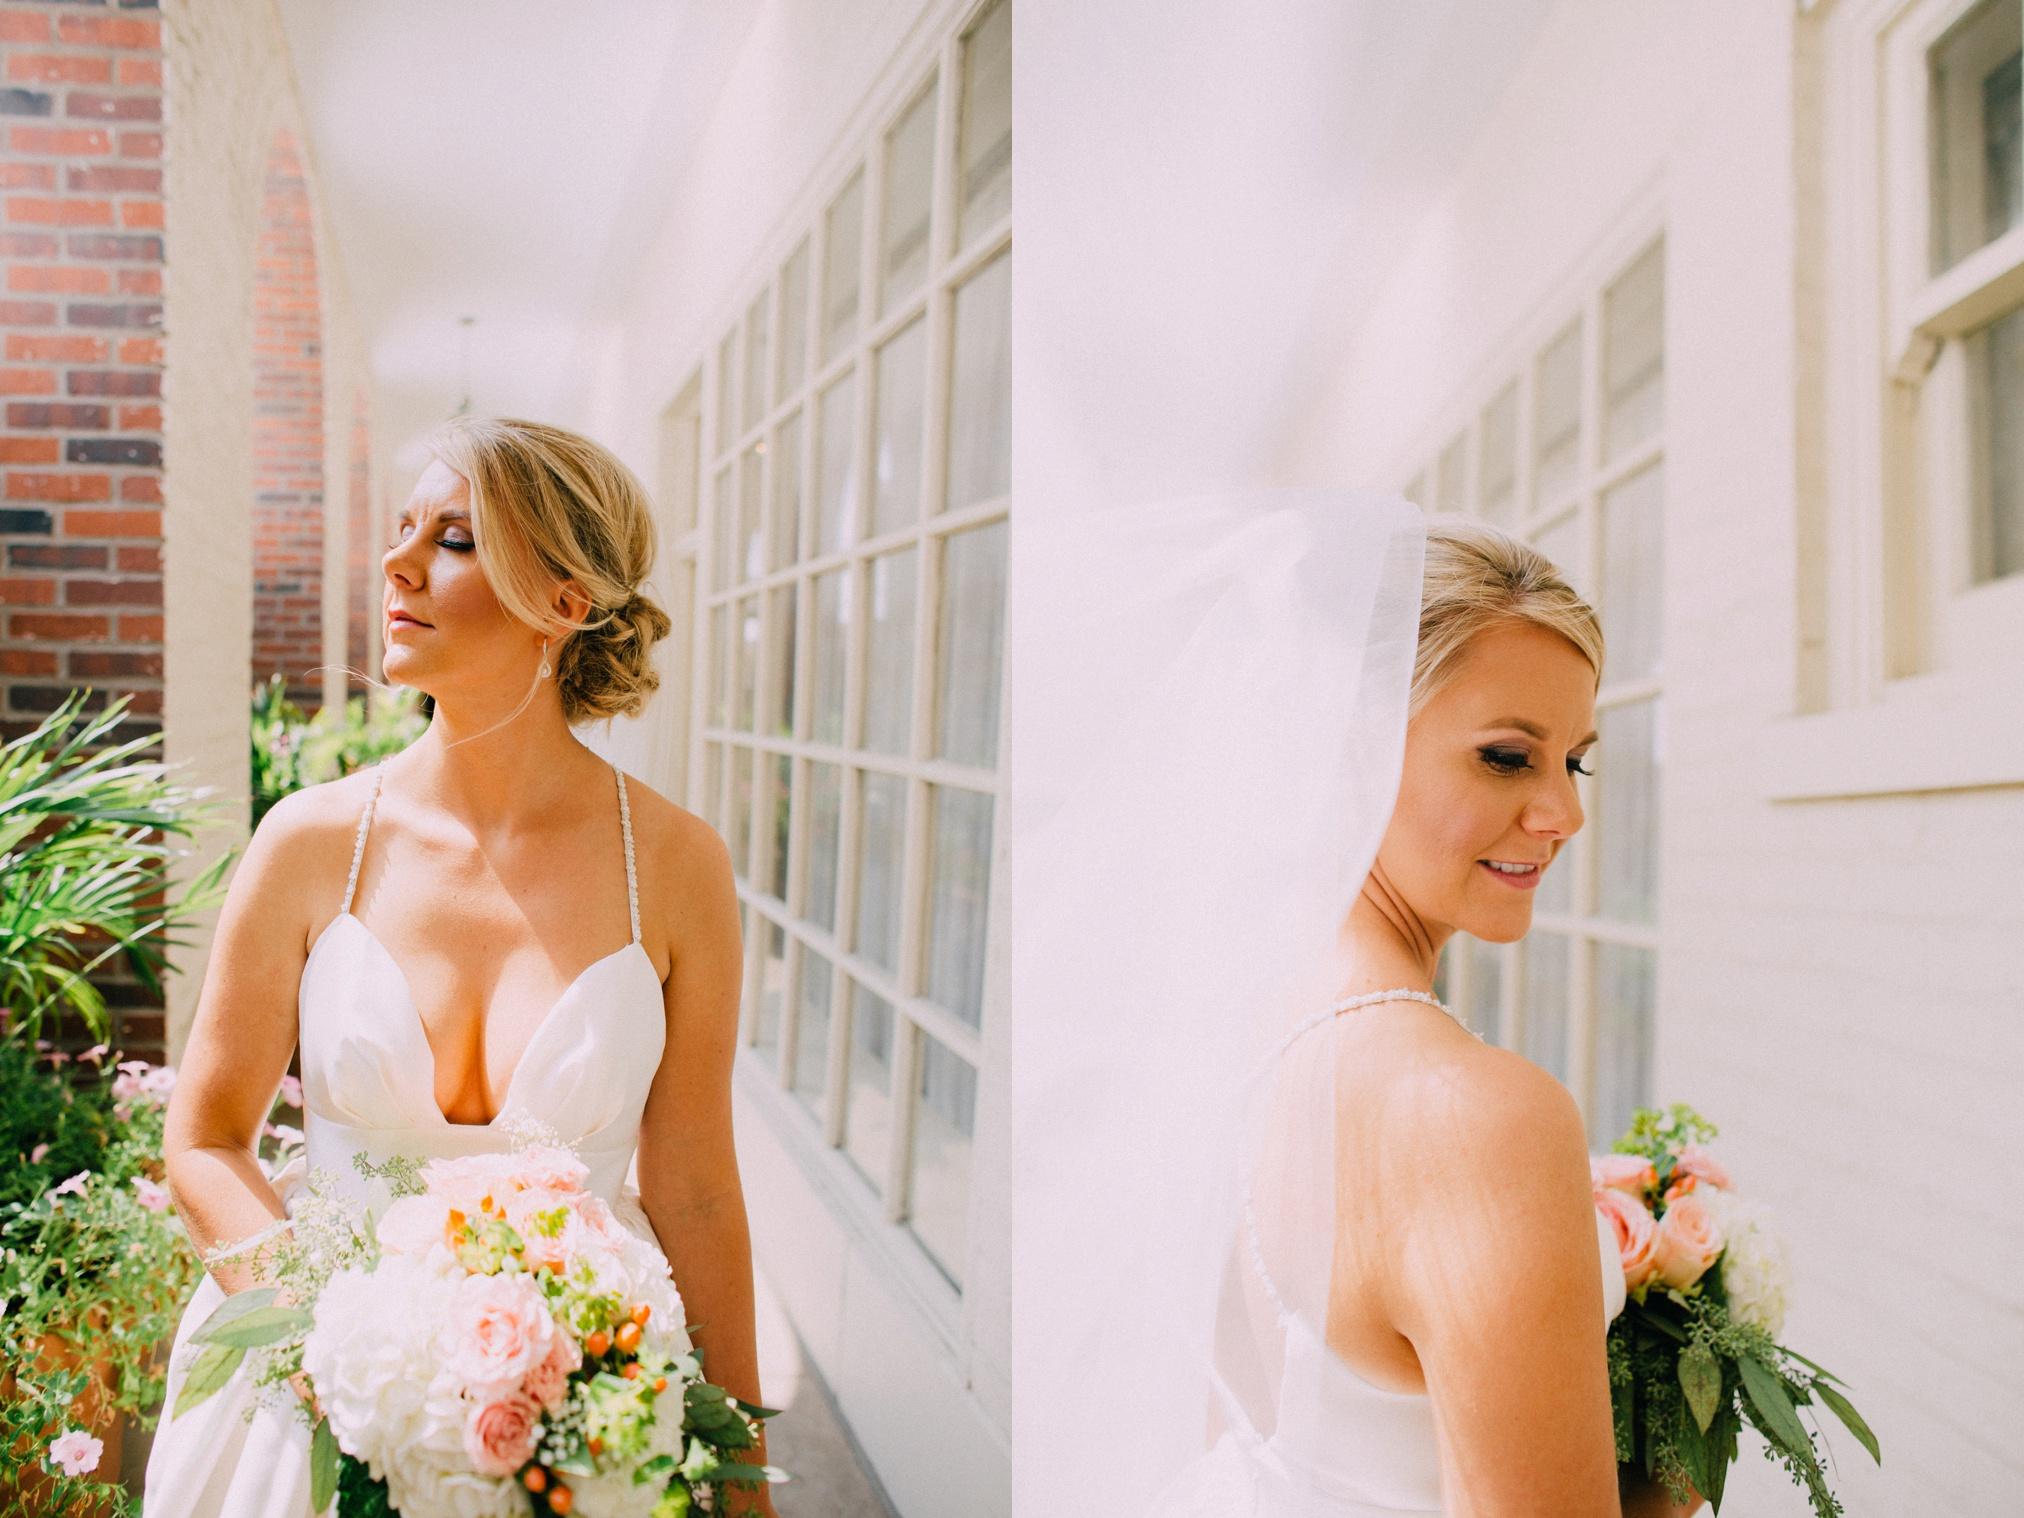 brenna+michael_wedding-211.jpg